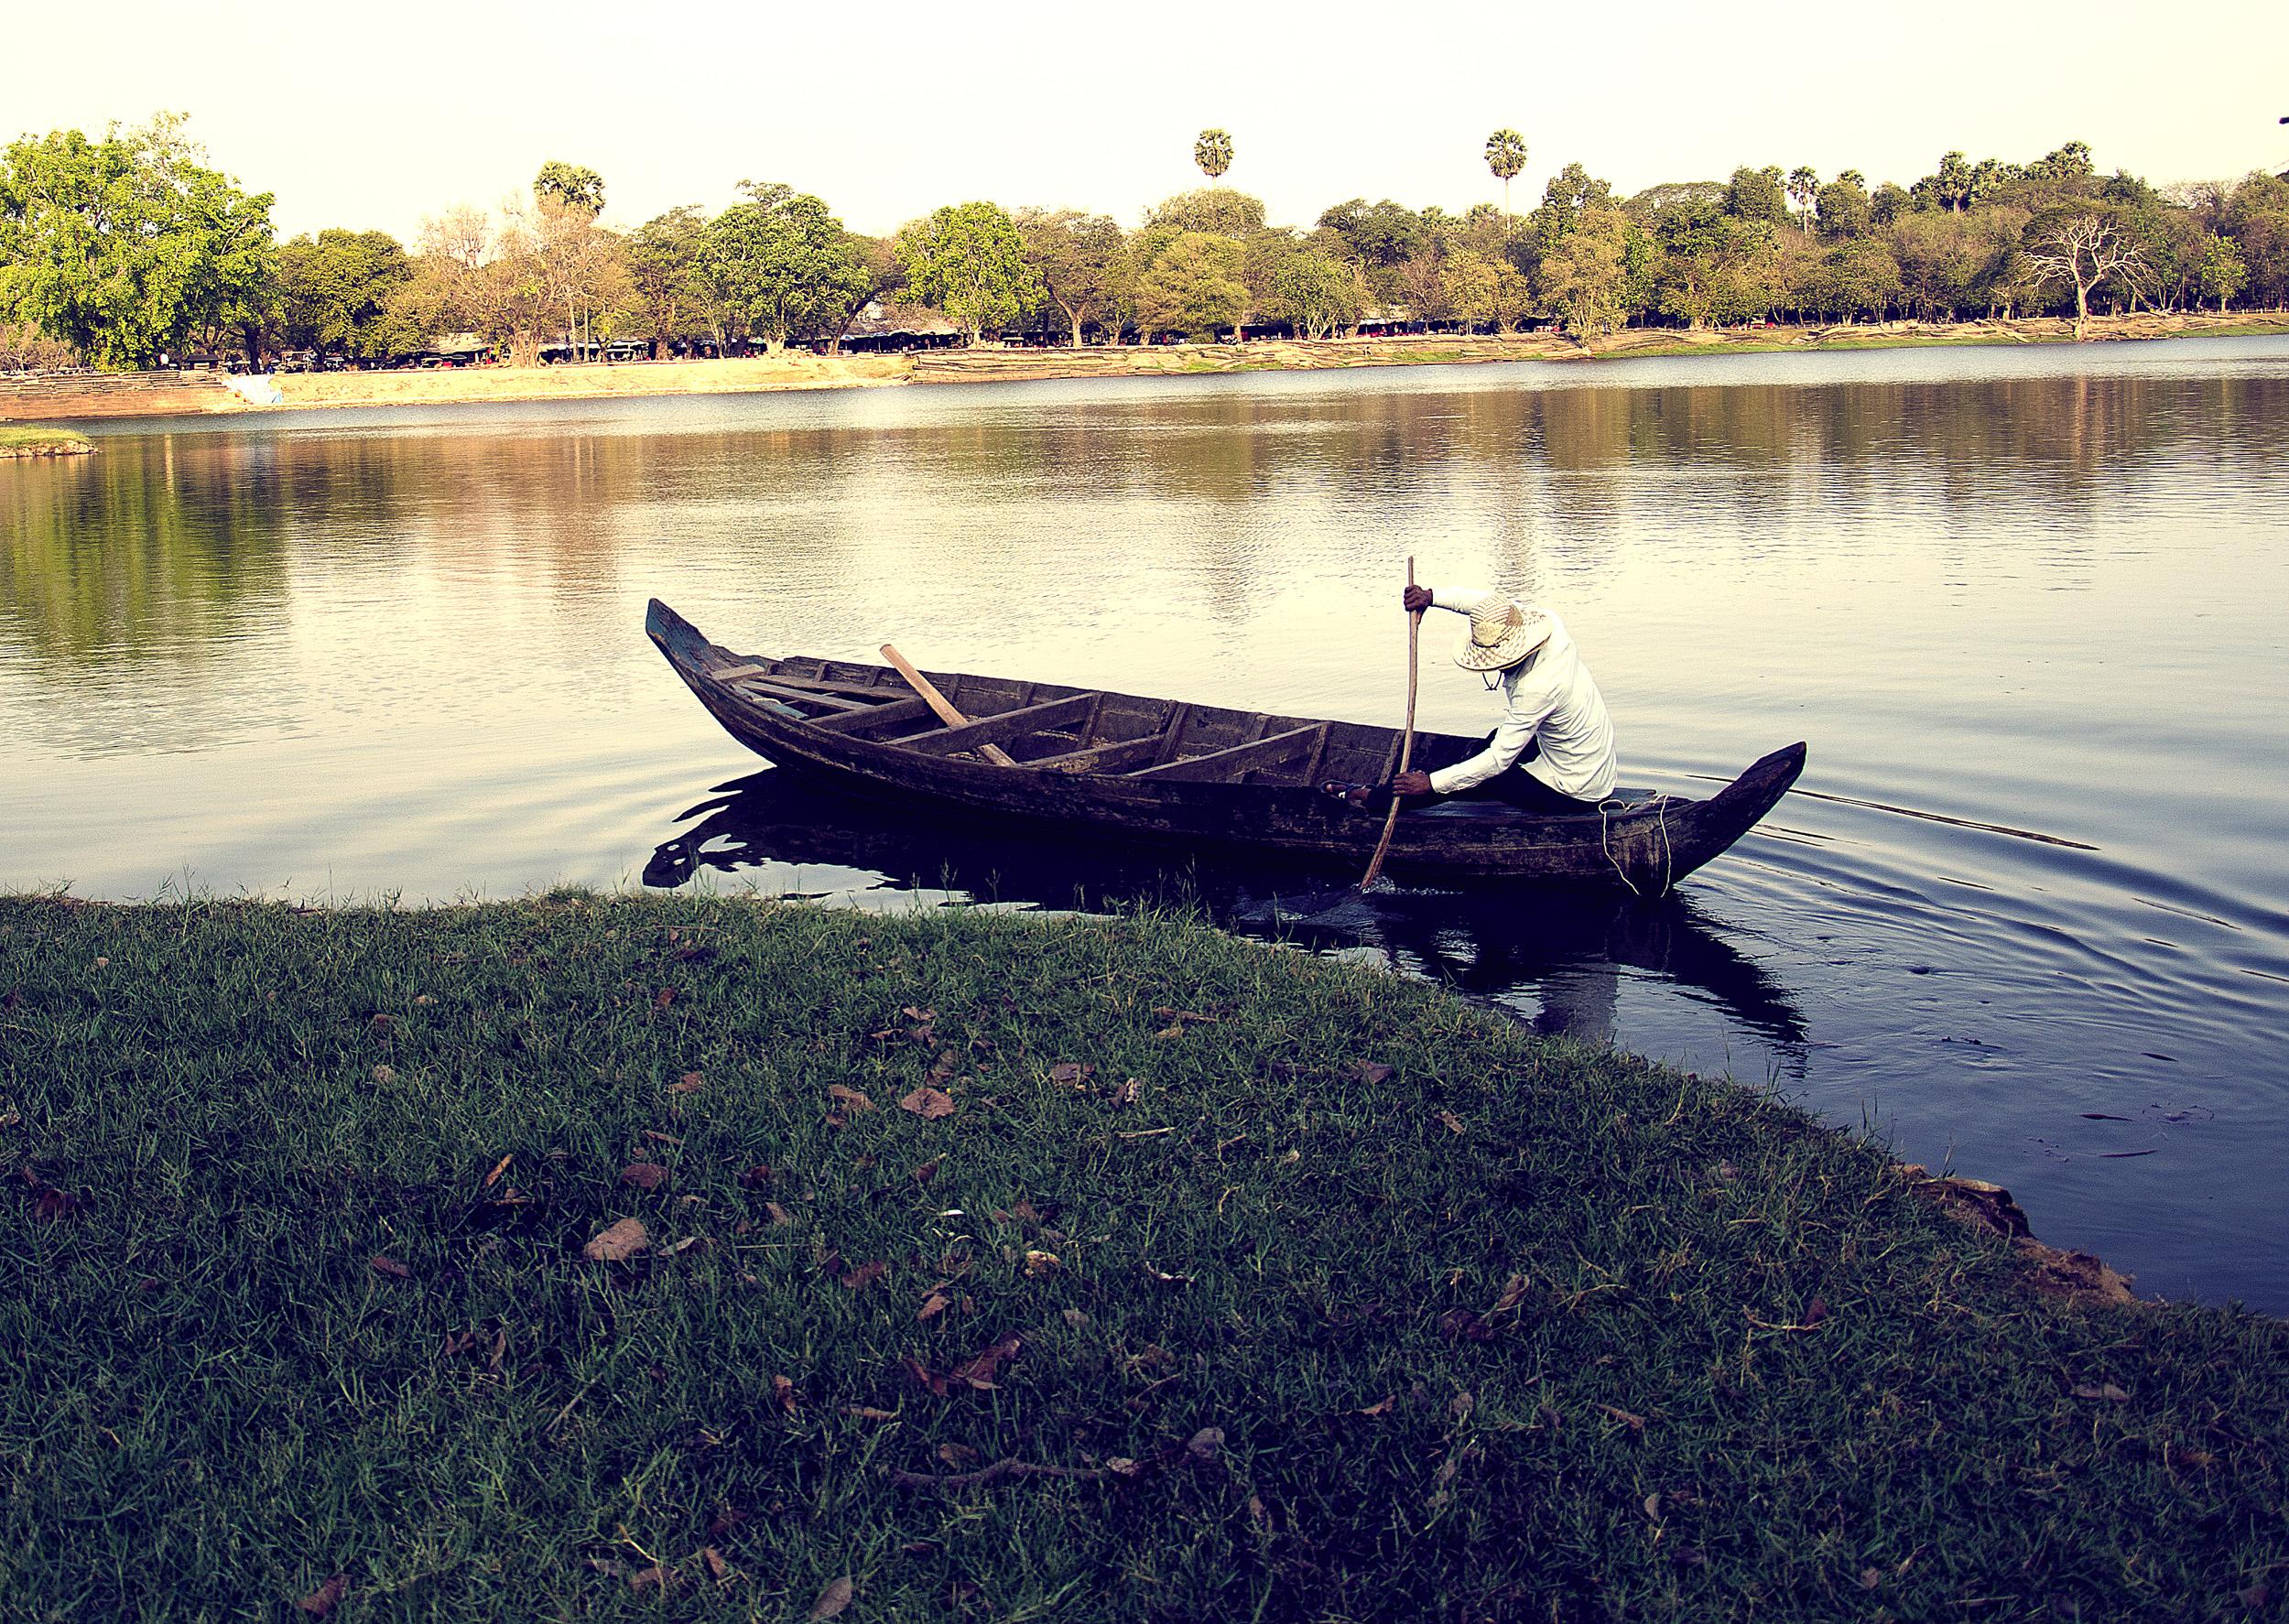 A dugout canoe ride across Angkor Wat's Moat!